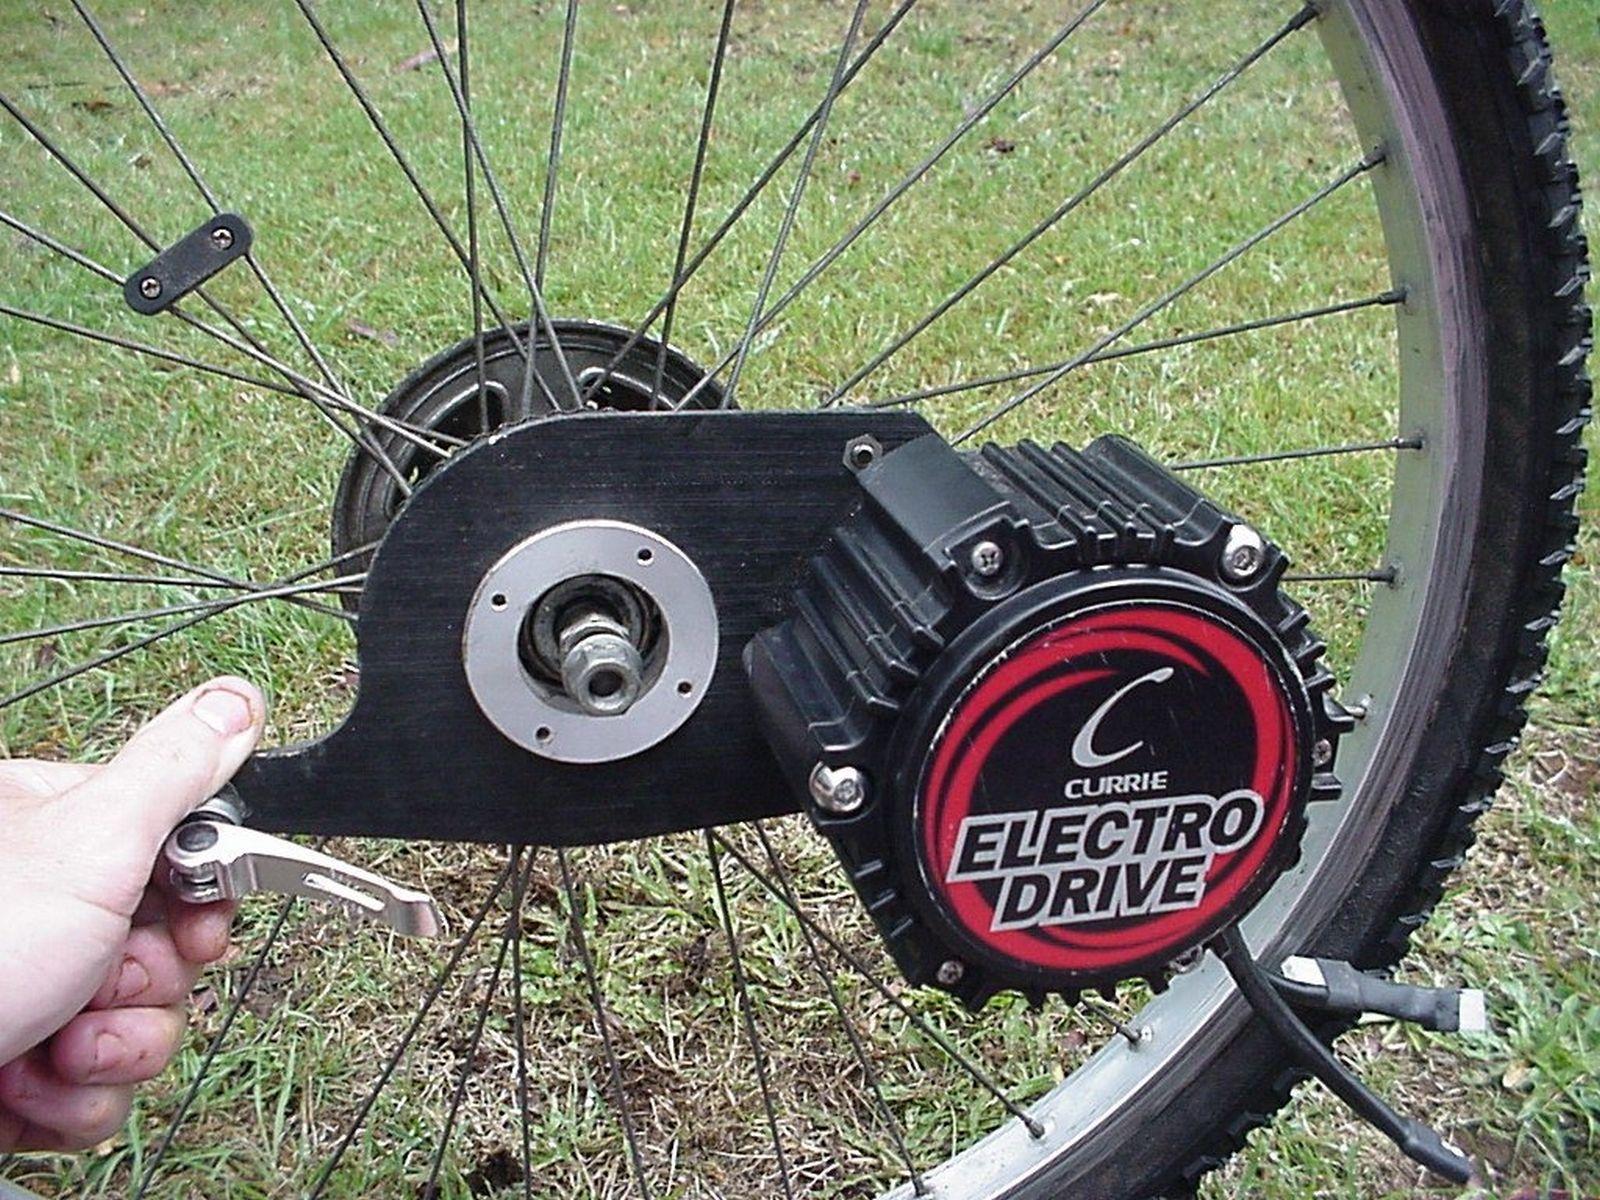 Currie Electrodrive Motor Mounting Electric Bike Diy Electric Bike Kits Bicycle Diy